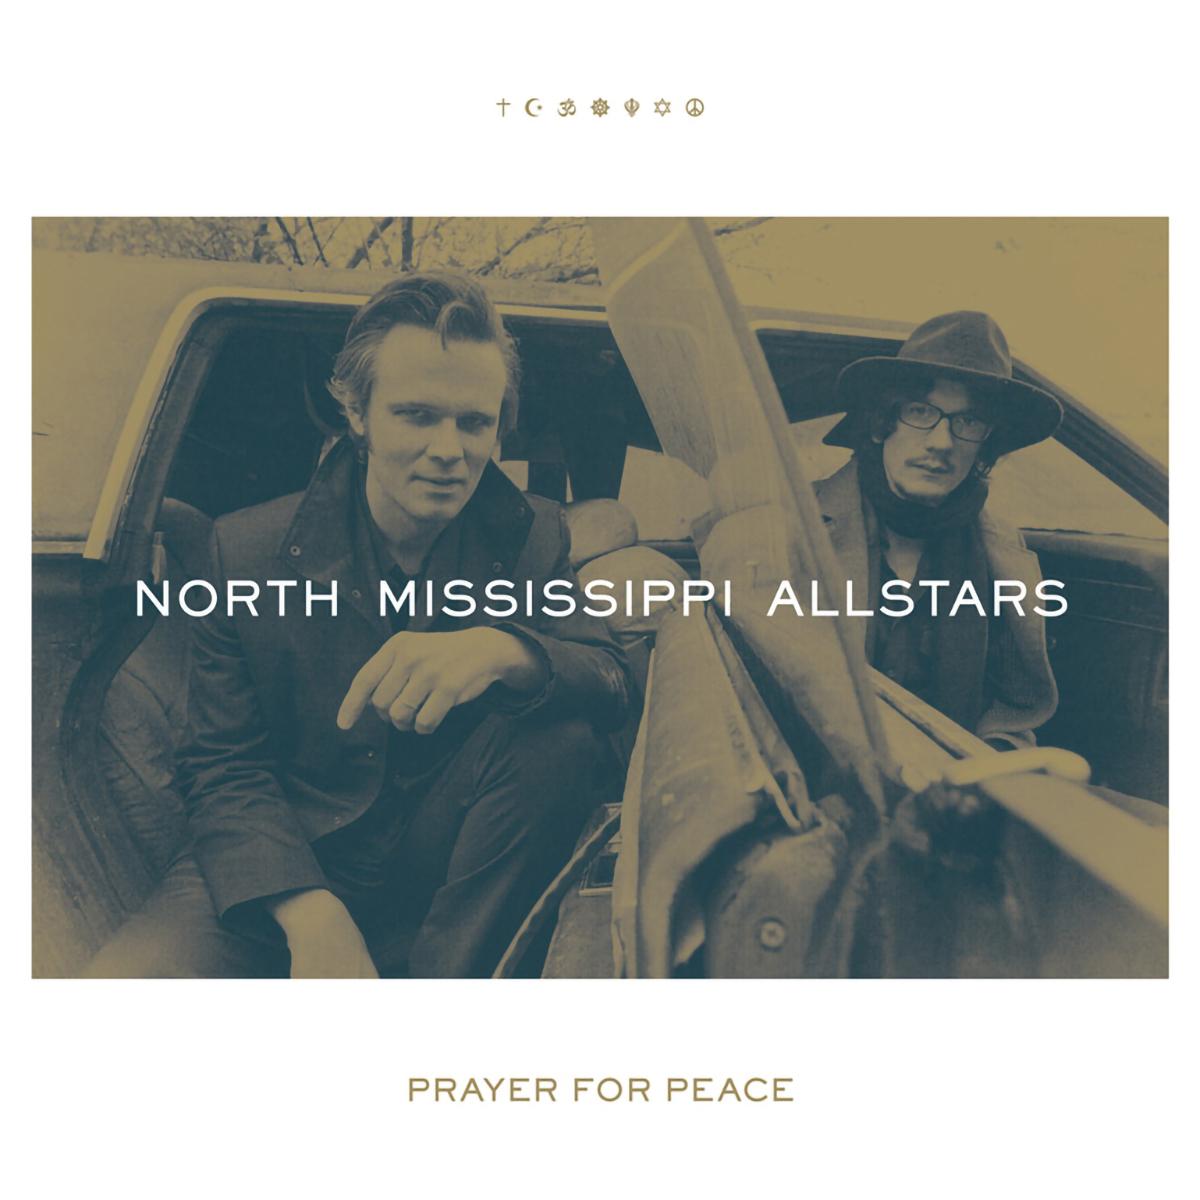 North Mississippi AllStars - Prayer for Peace Vinyl